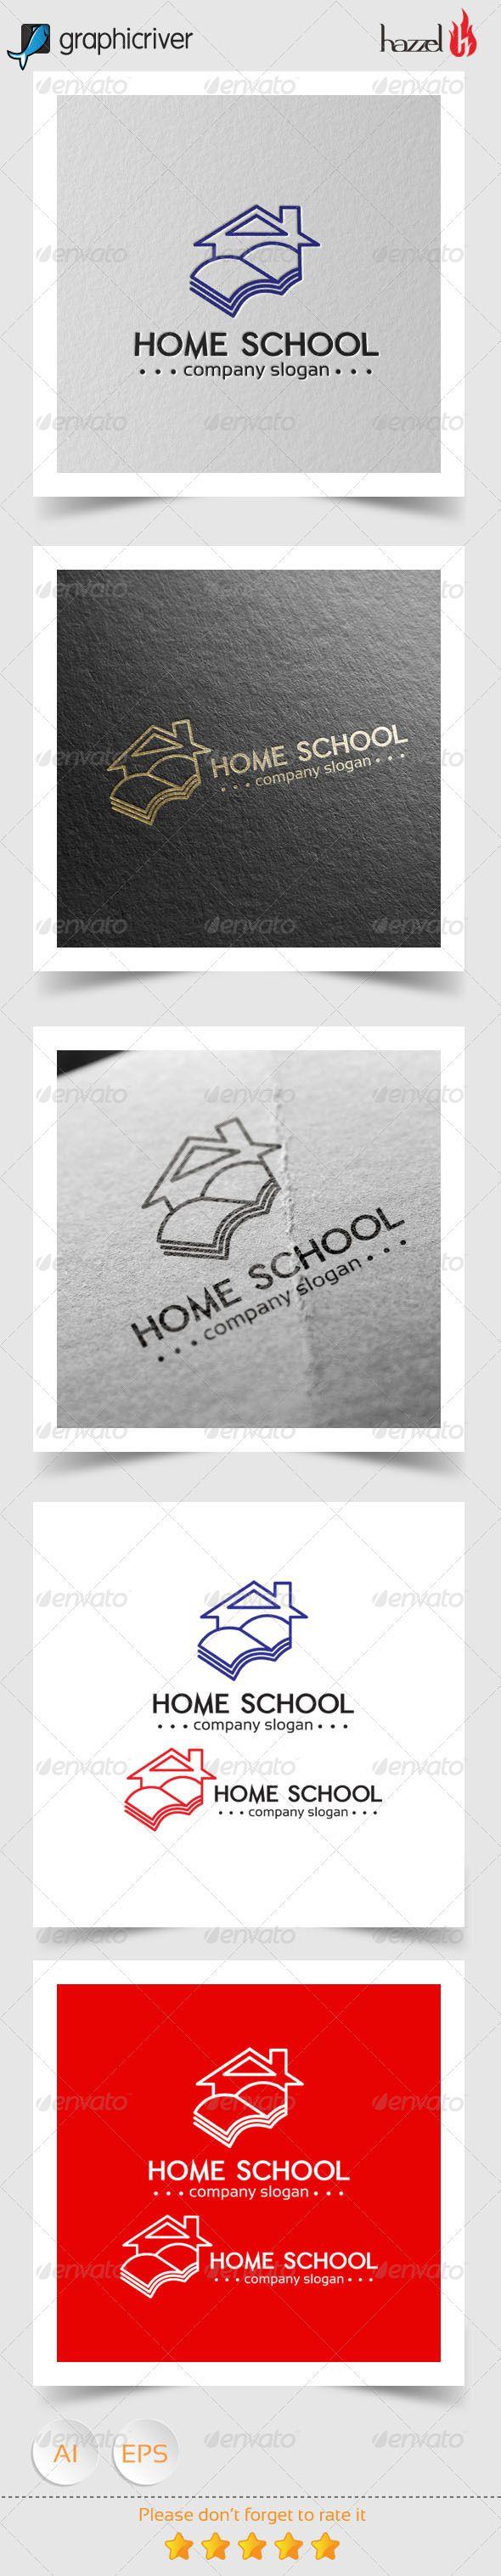 Home School Logo